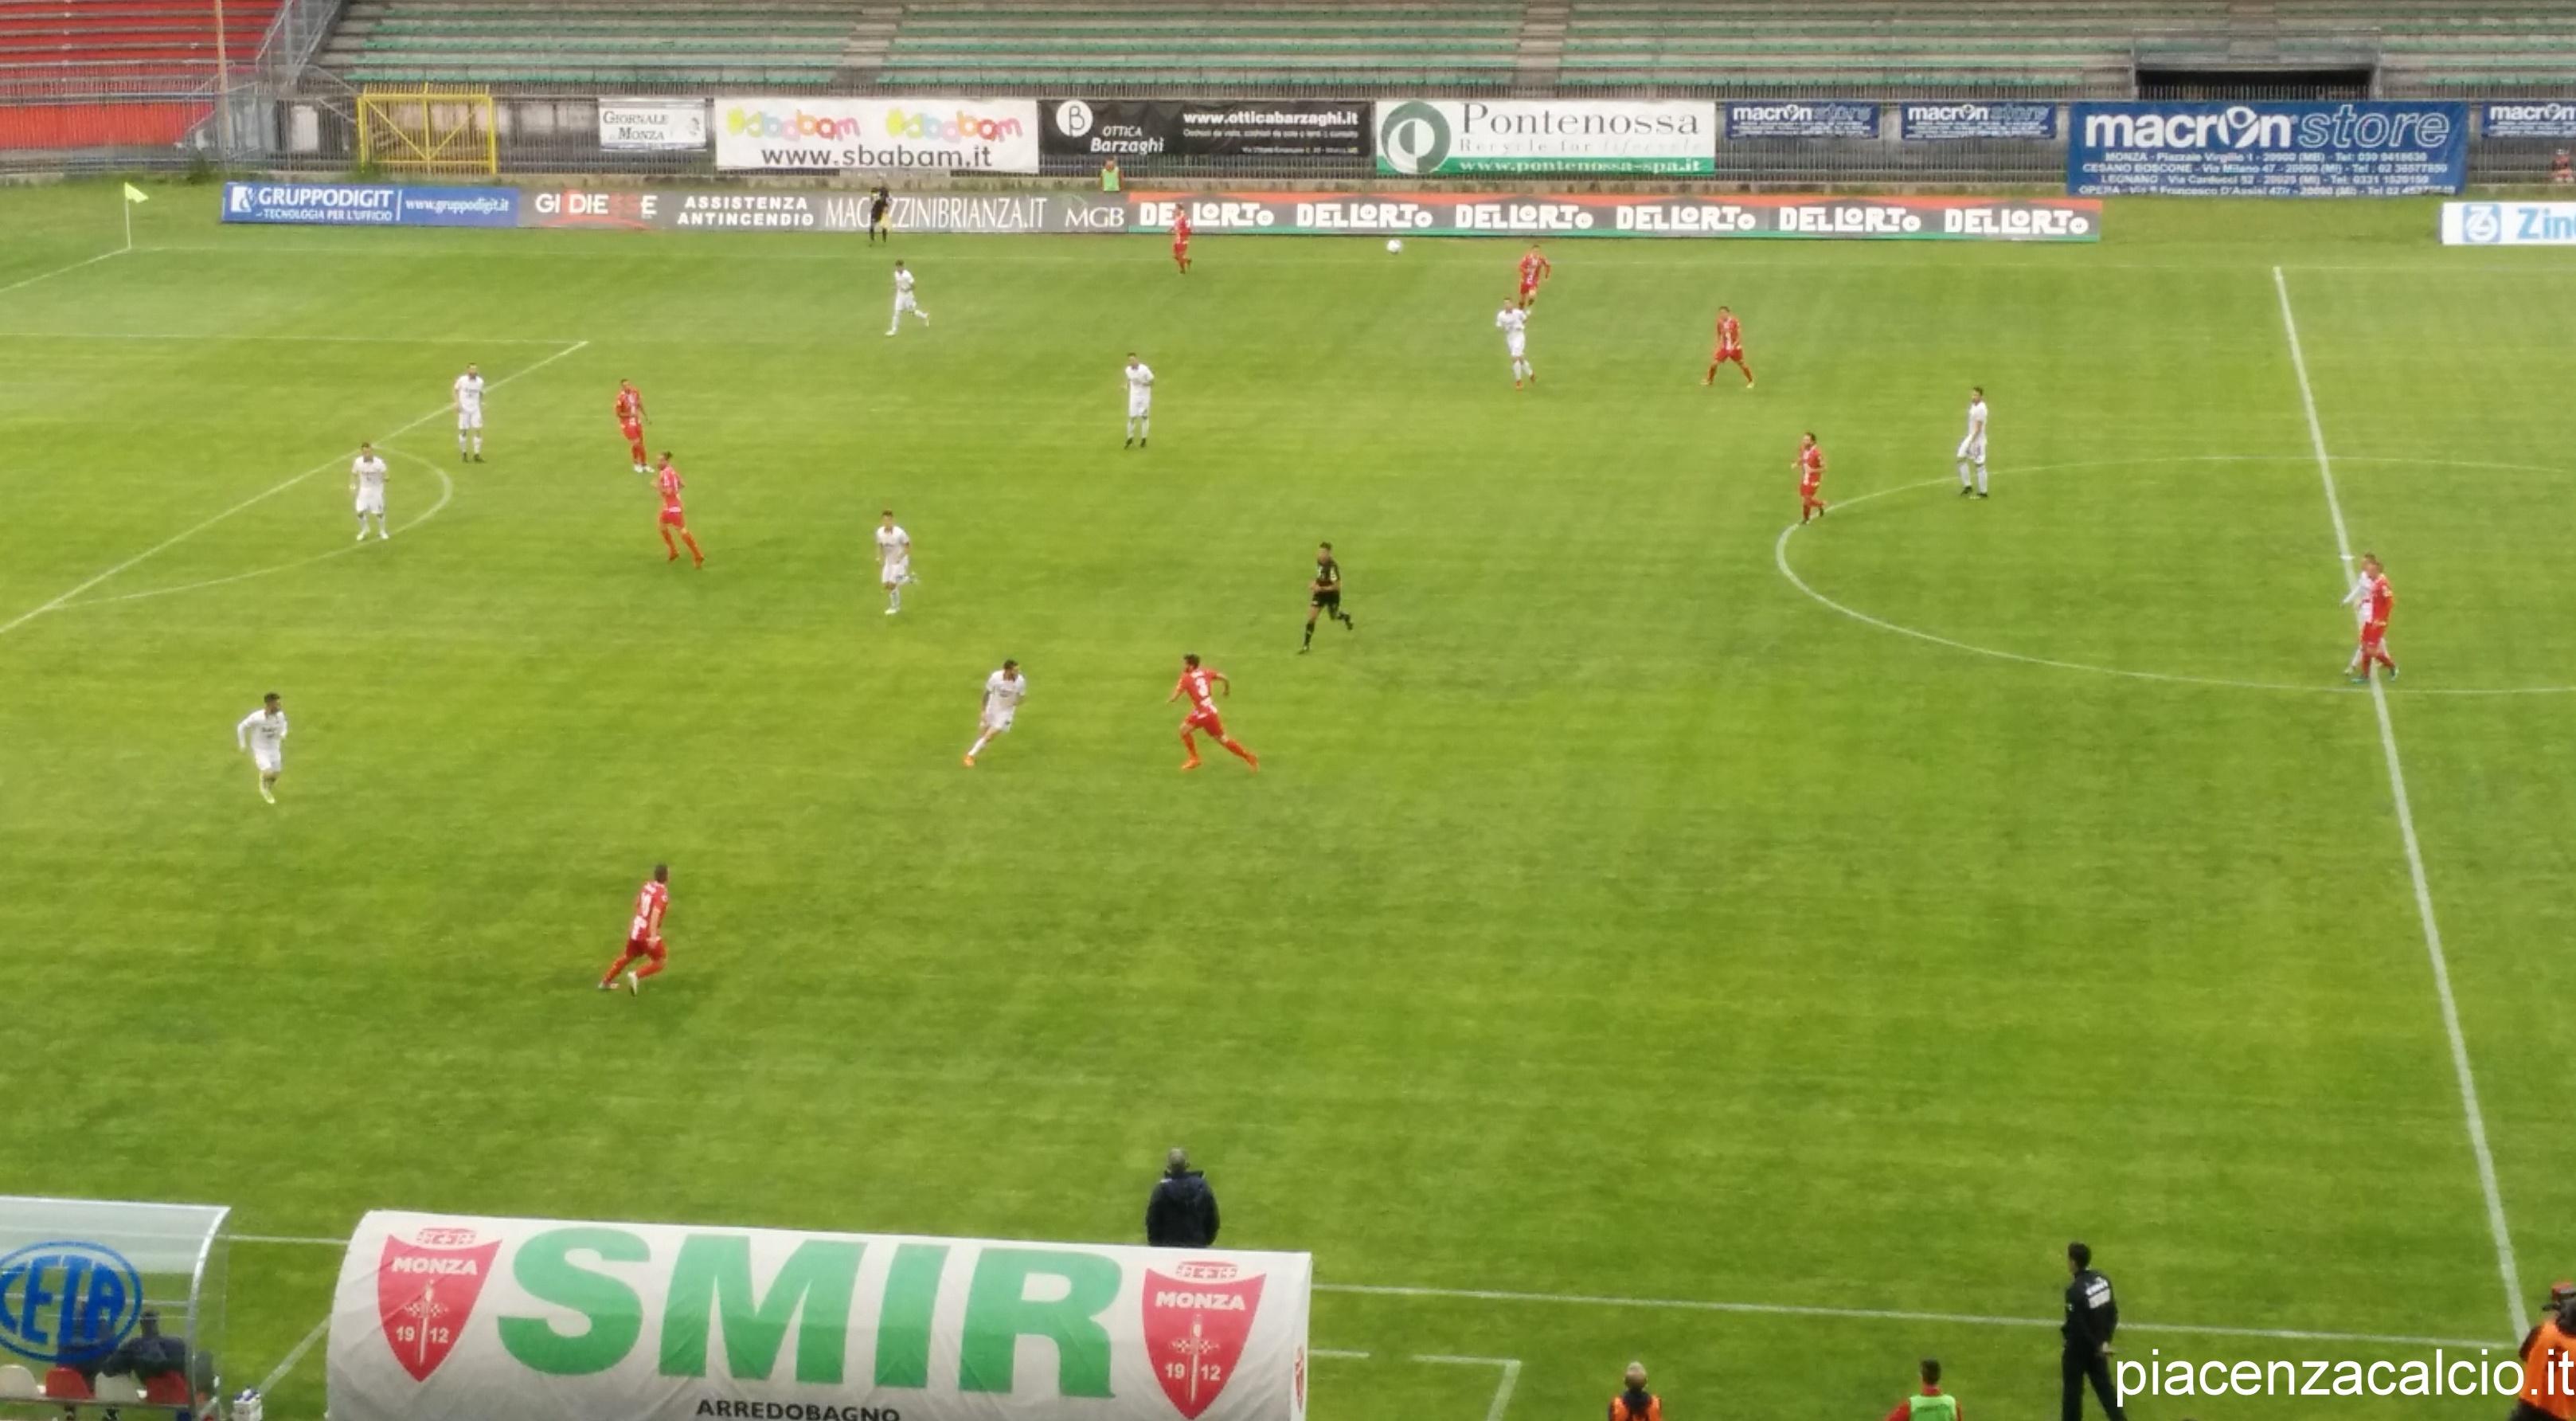 Monza - Piacenza, Playoff